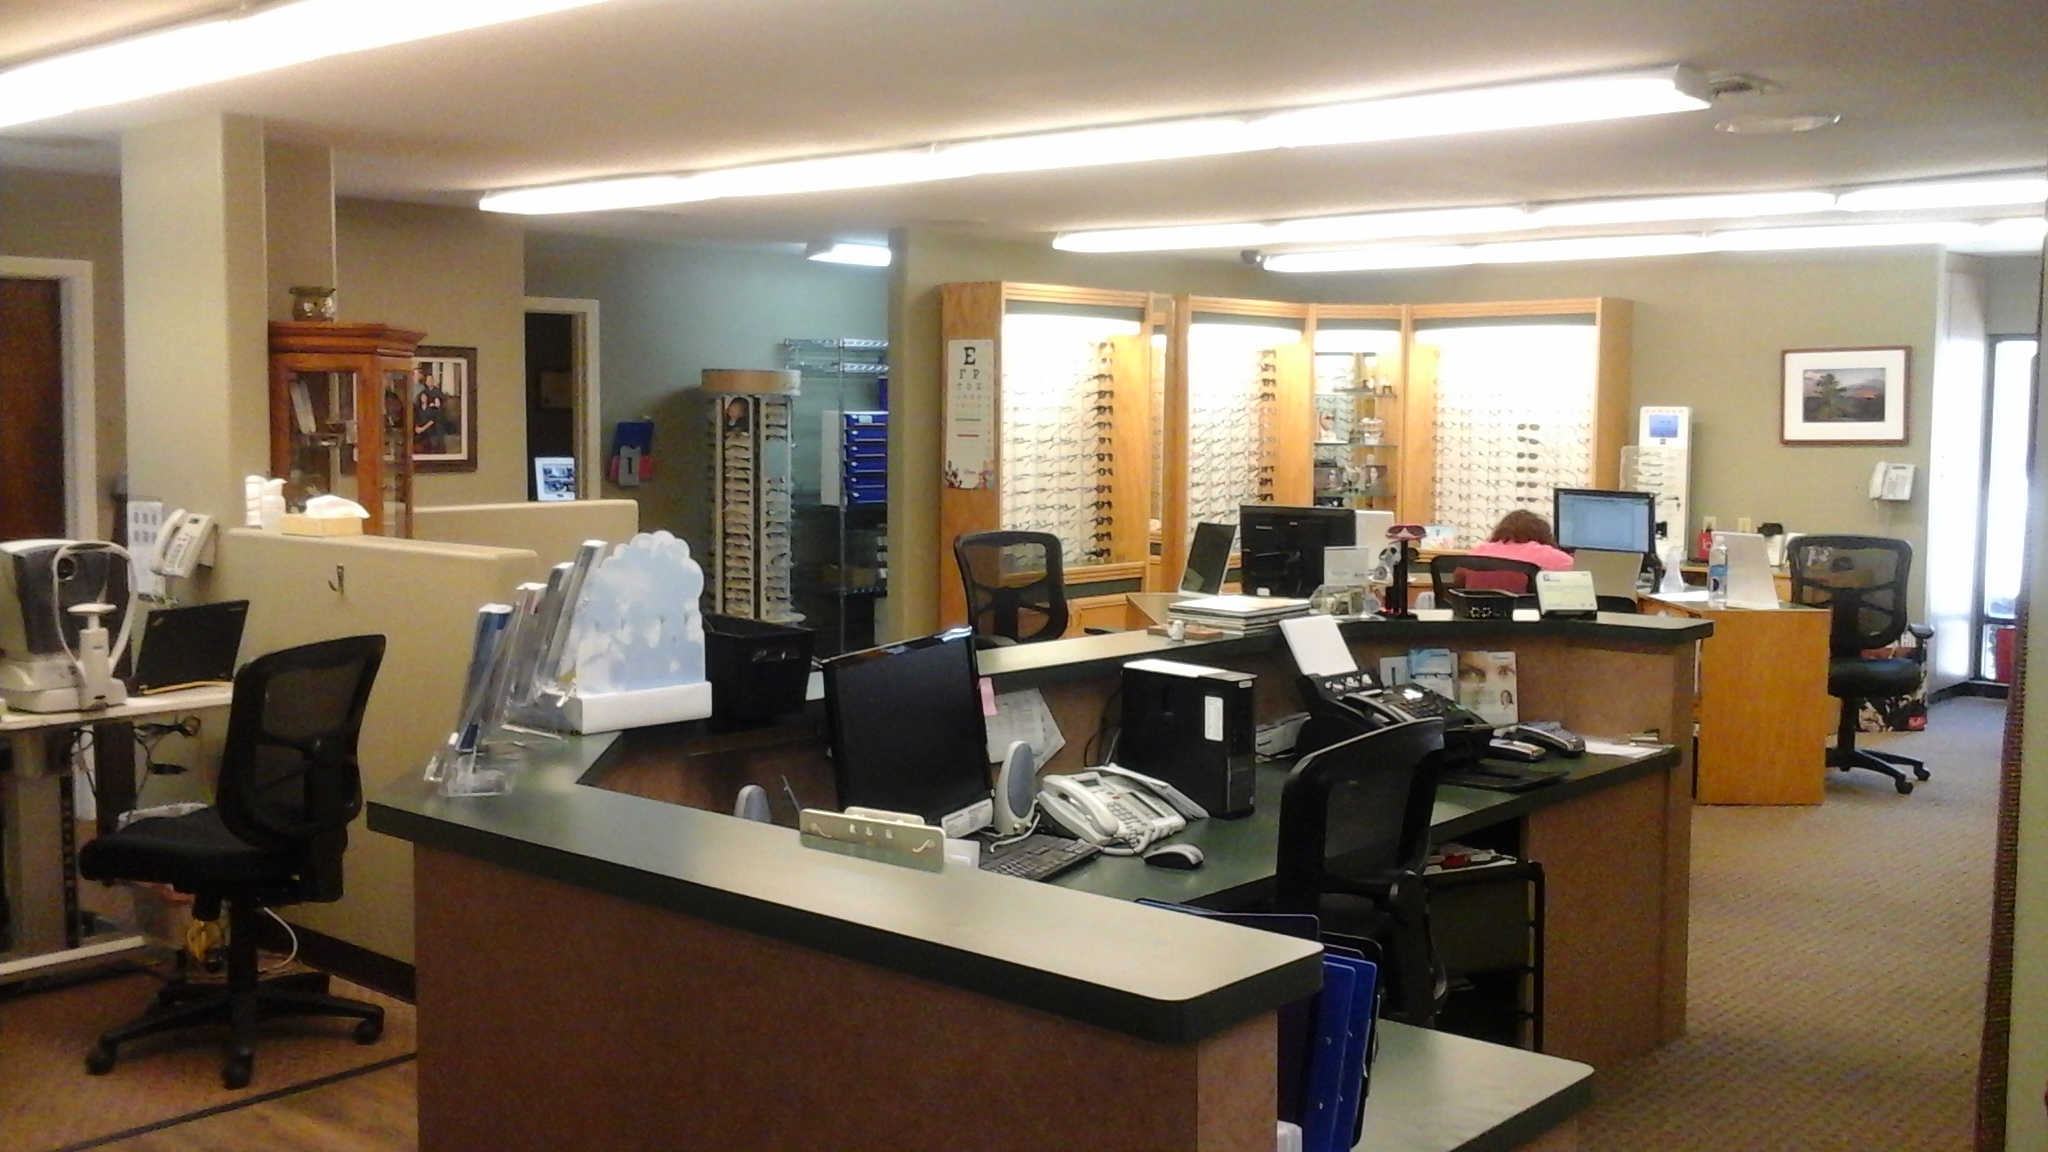 LaFont Family Eyecare Optometry image 2